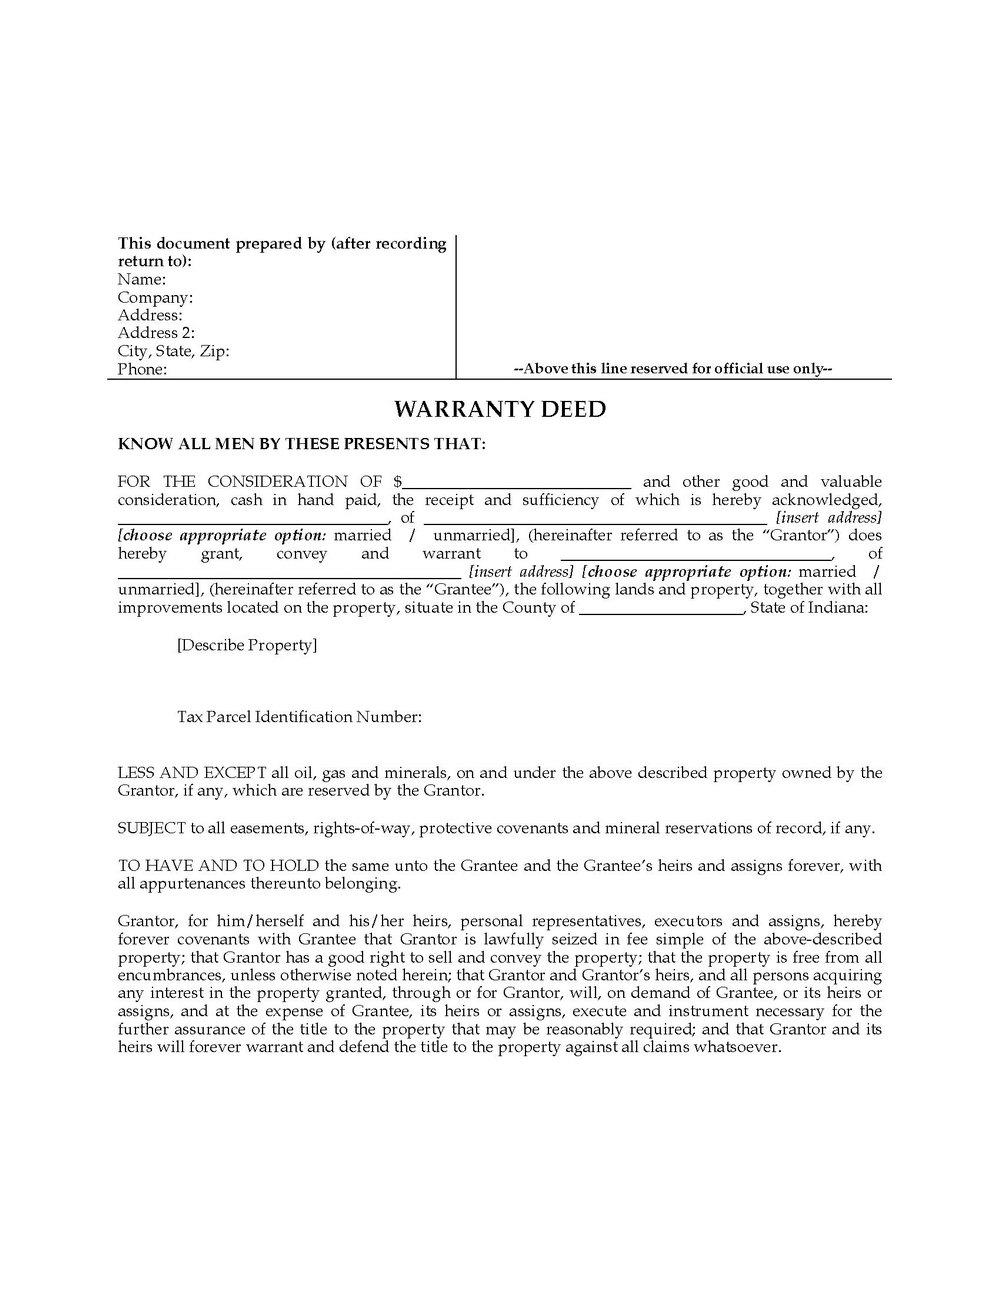 Warranty Deed Form North Carolina